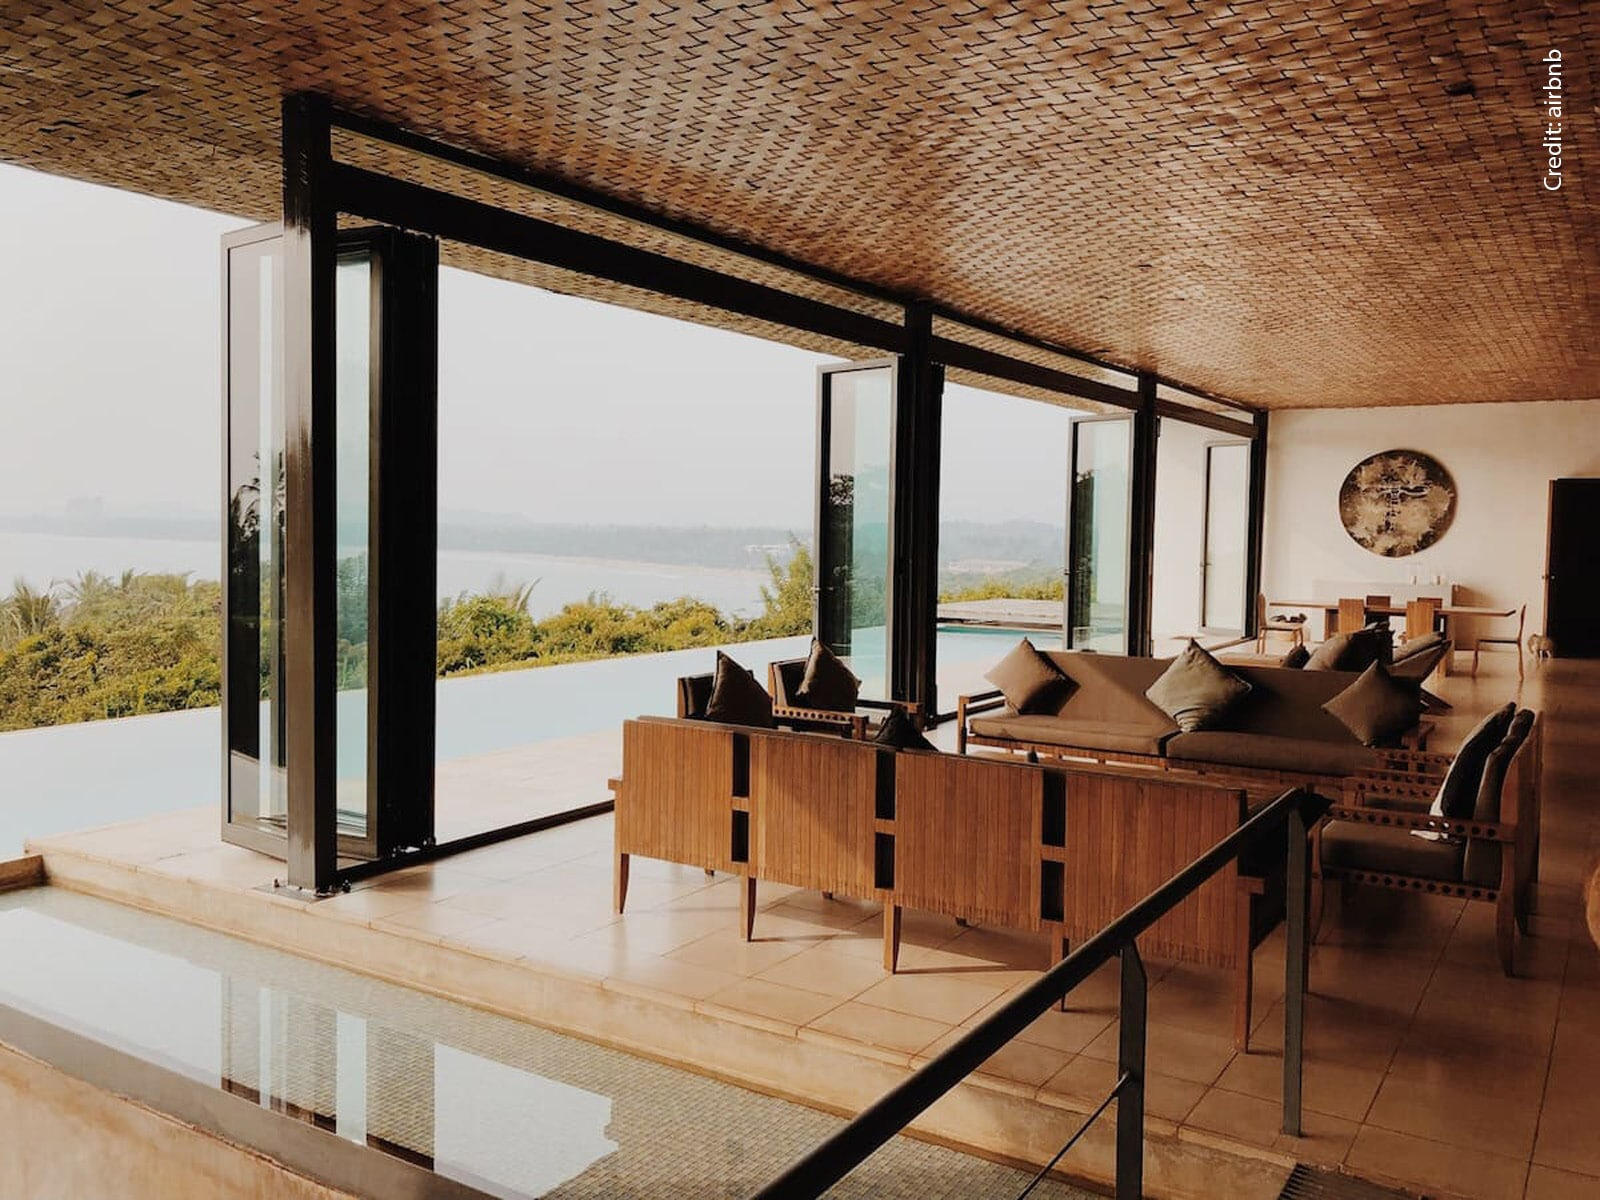 villa vista karya arsitek shigeru ban